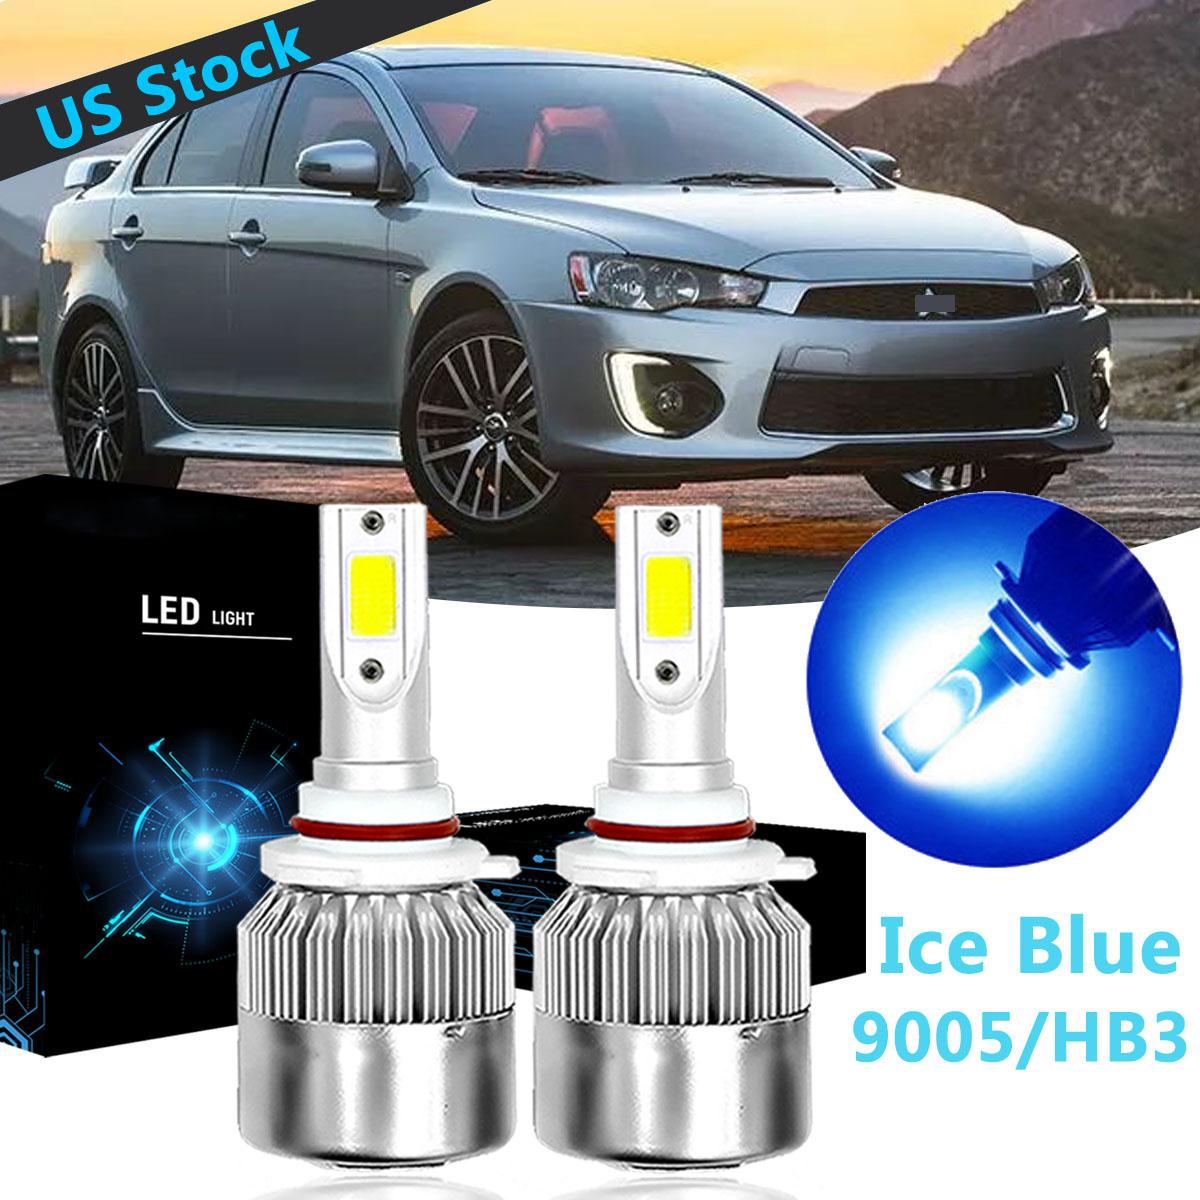 LED Headlight Kit 9005 6000K White HighBeam Bulb for MITSUBISHI Lancer 2008-2017